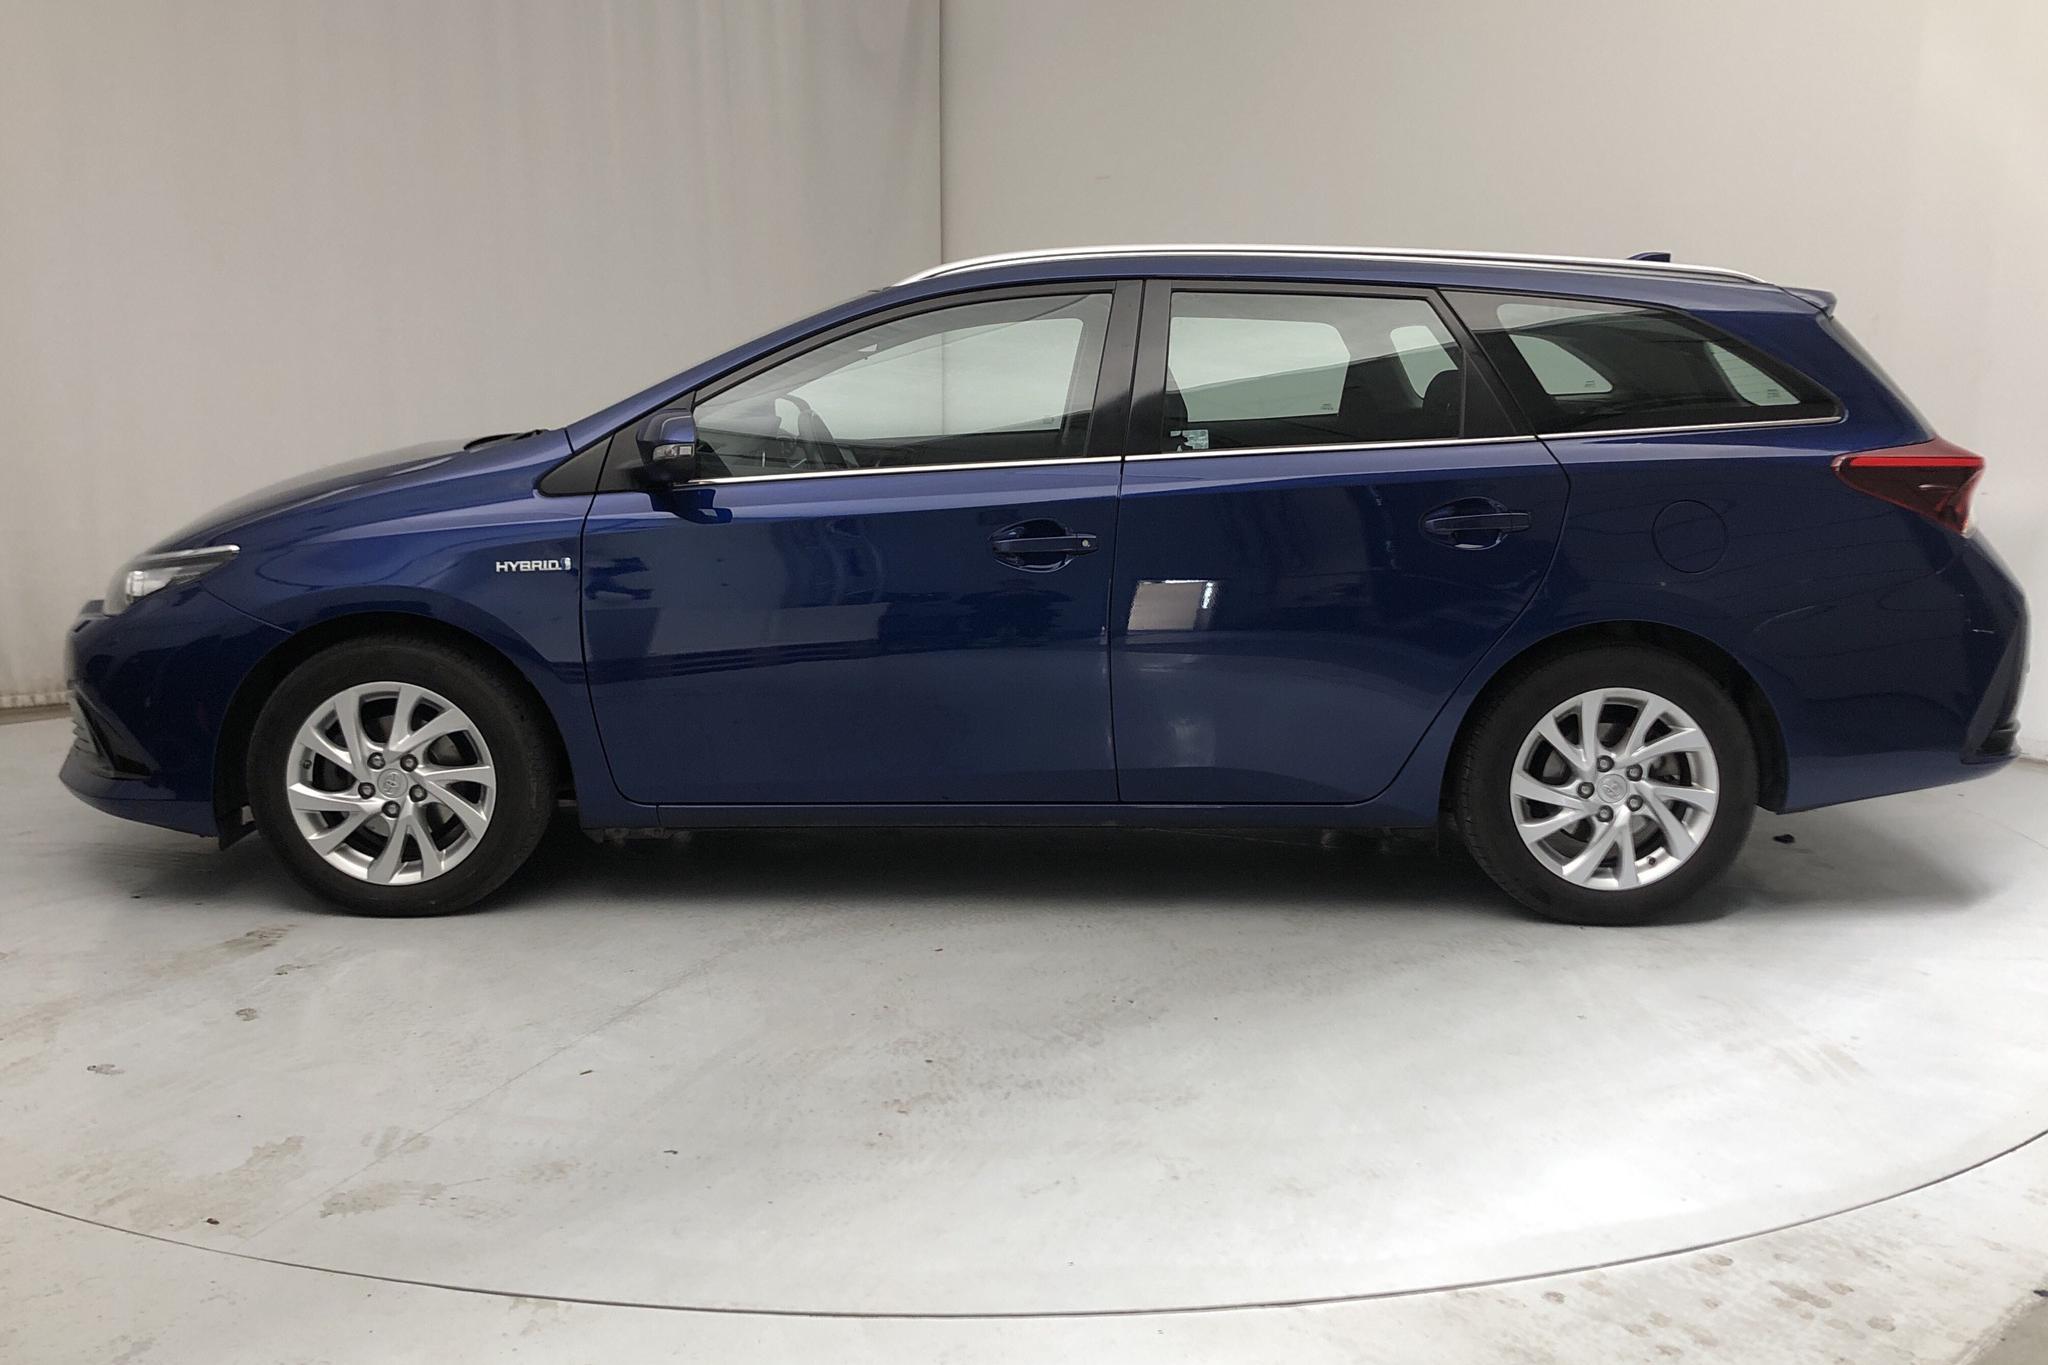 Toyota Auris 1.8 HSD Touring Sports (99hk) - 7 446 mil - Automat - Dark Blue - 2017